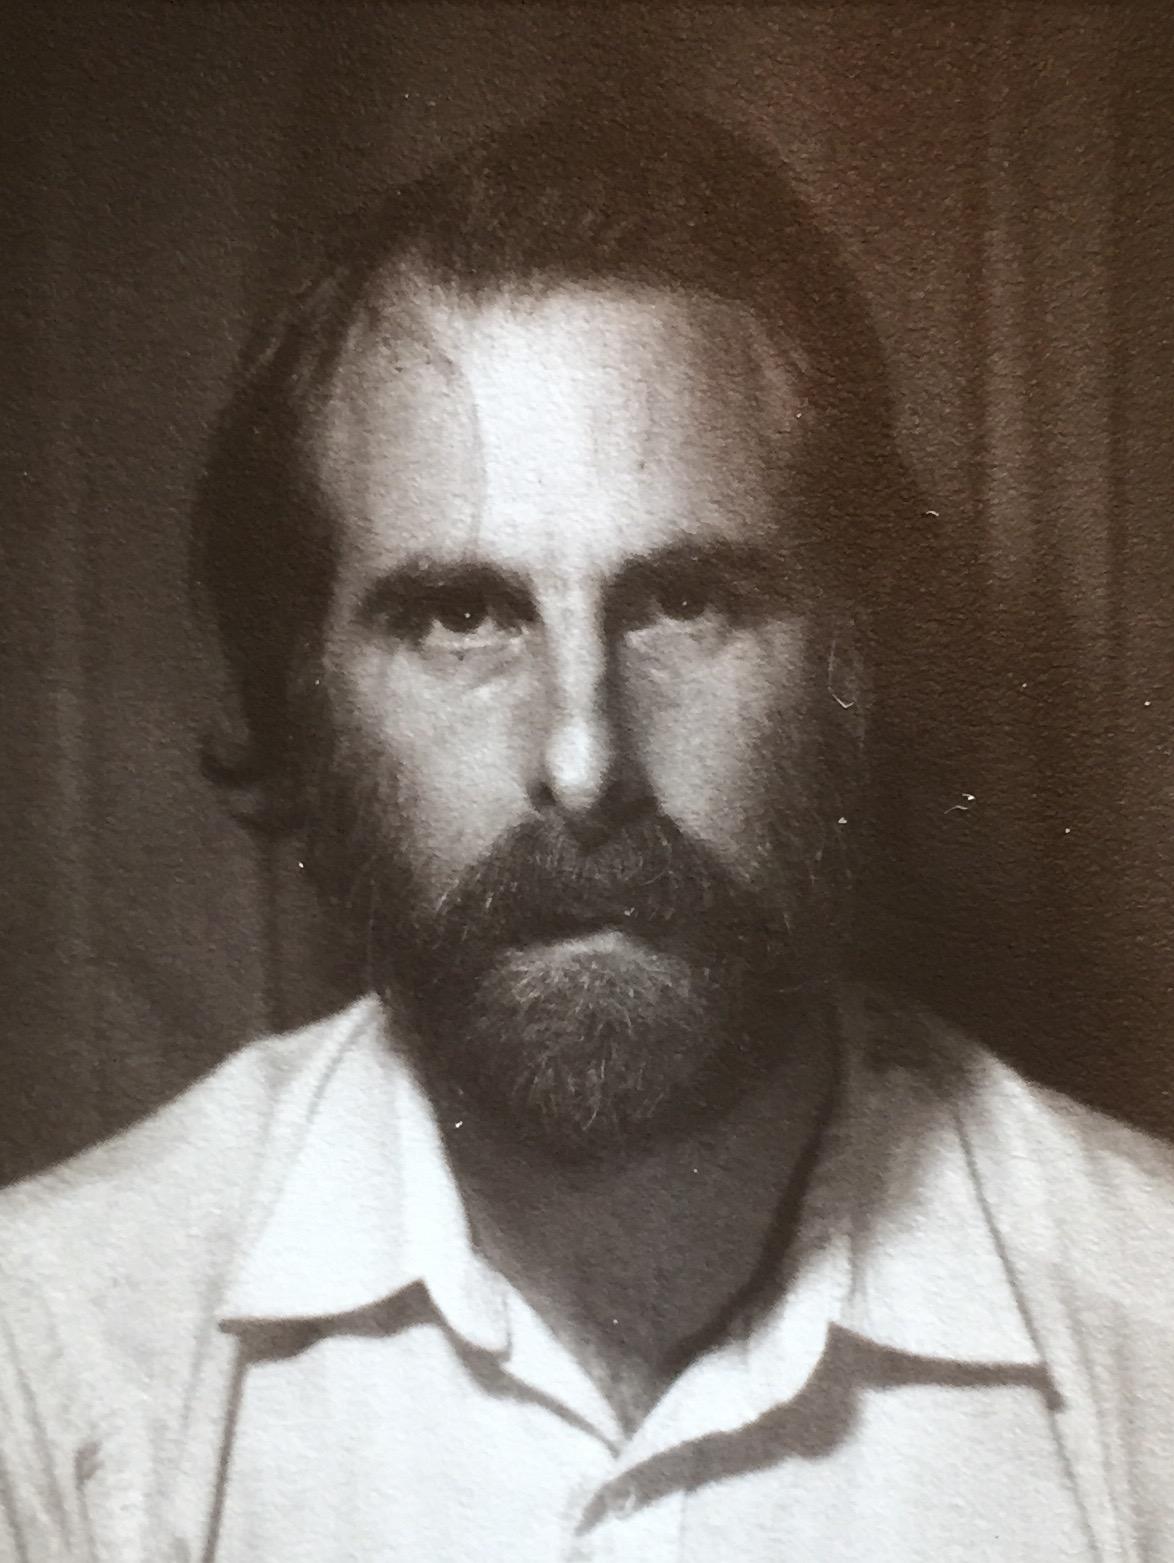 Rick Alverson